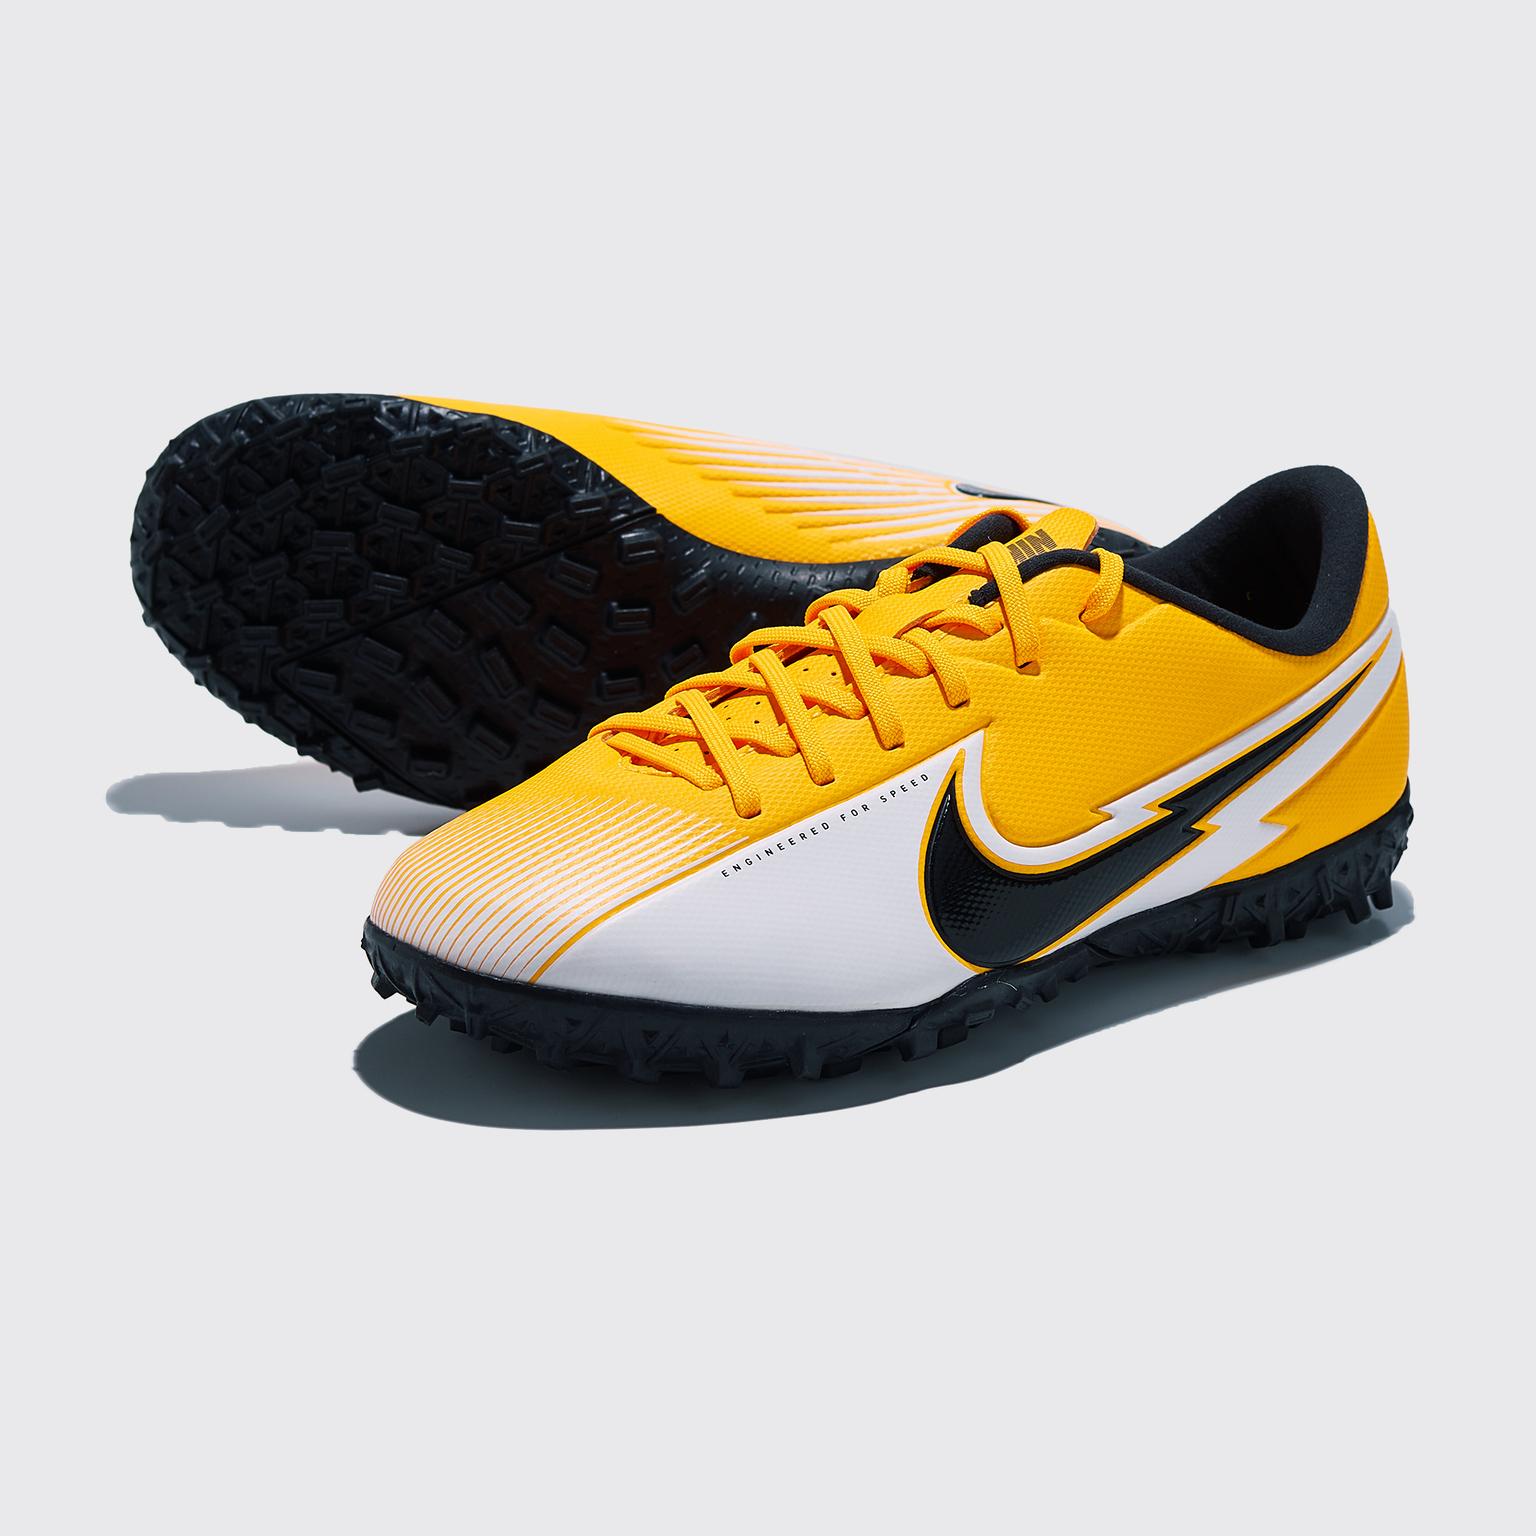 Фото - Шиповки детские Nike Vapor 13 Academy TF AT8145-801 шиповки детские nike vapor 13 academy neymar tf at8144 104